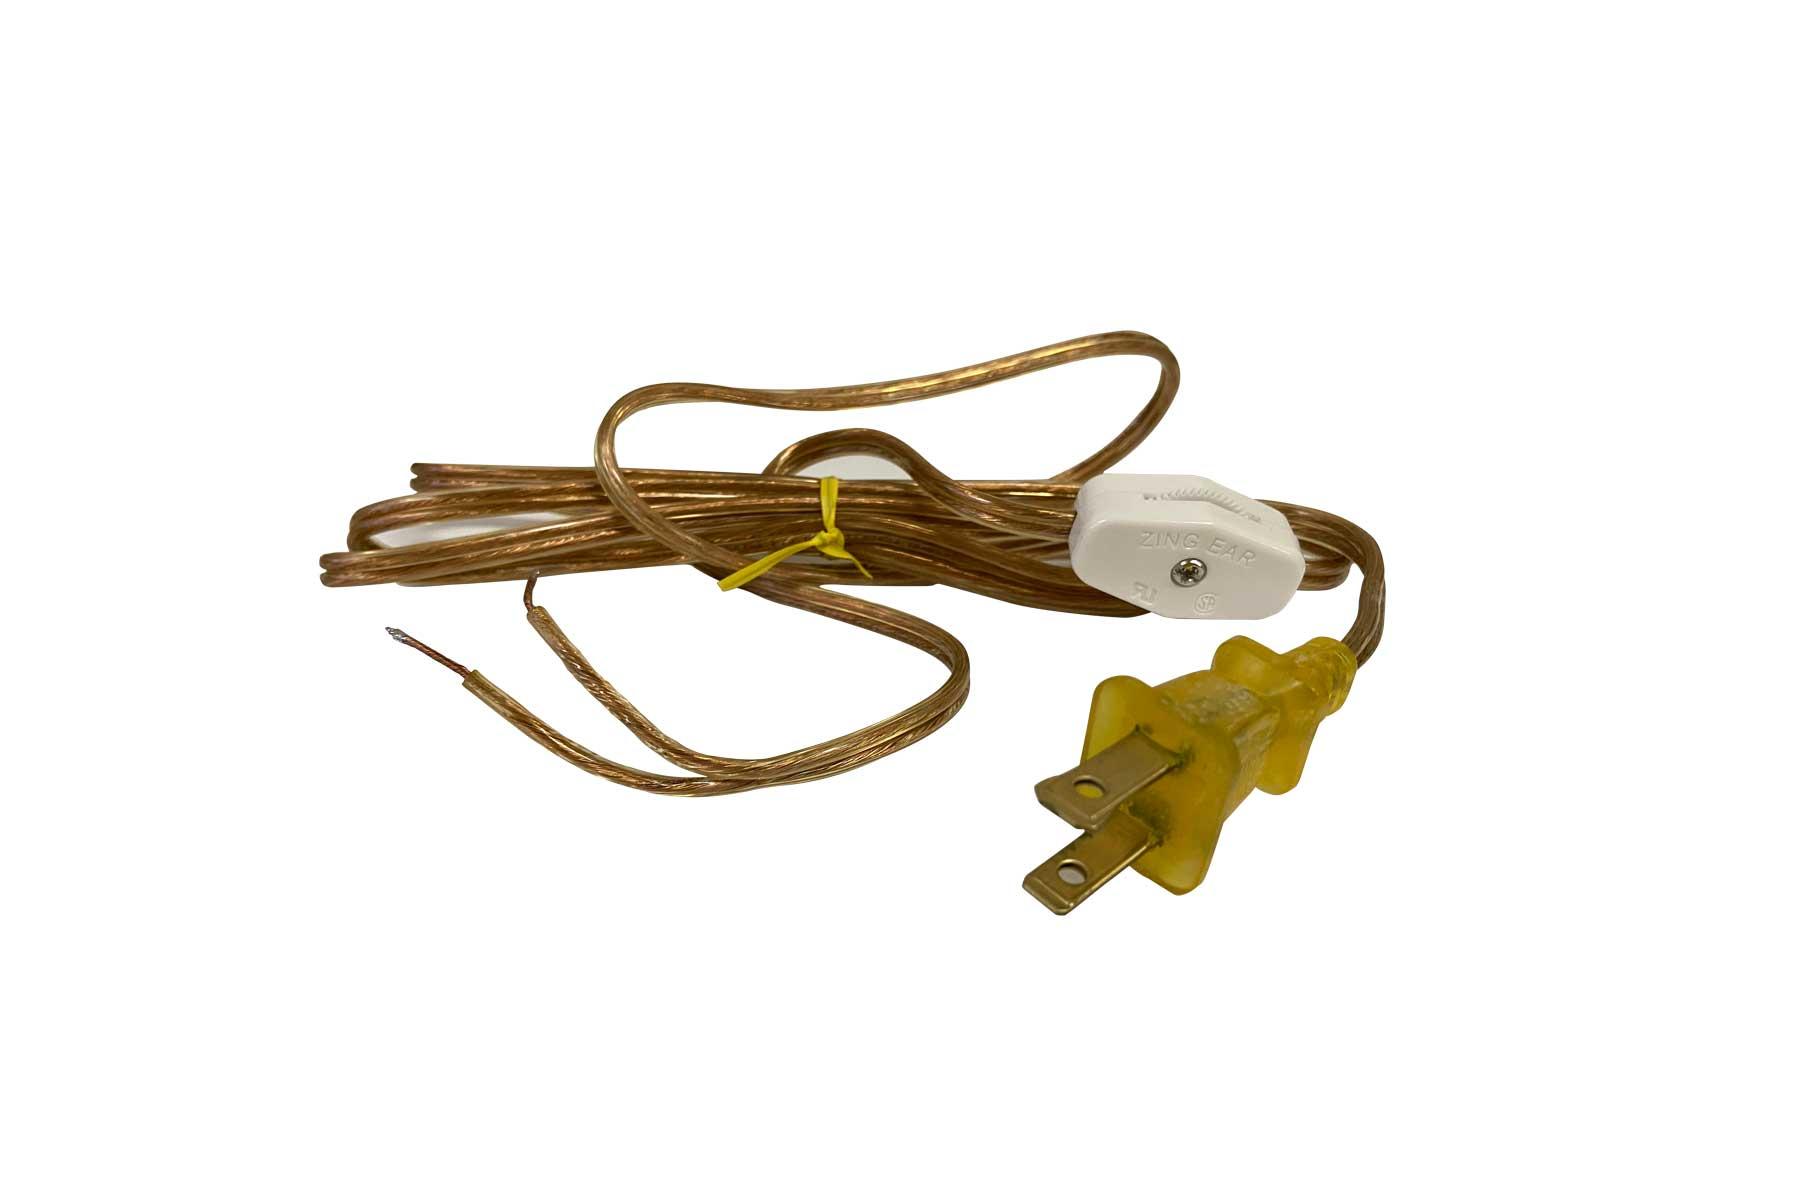 NEMA 1-15P - 6 ft. SPT-1 AC Power Cord